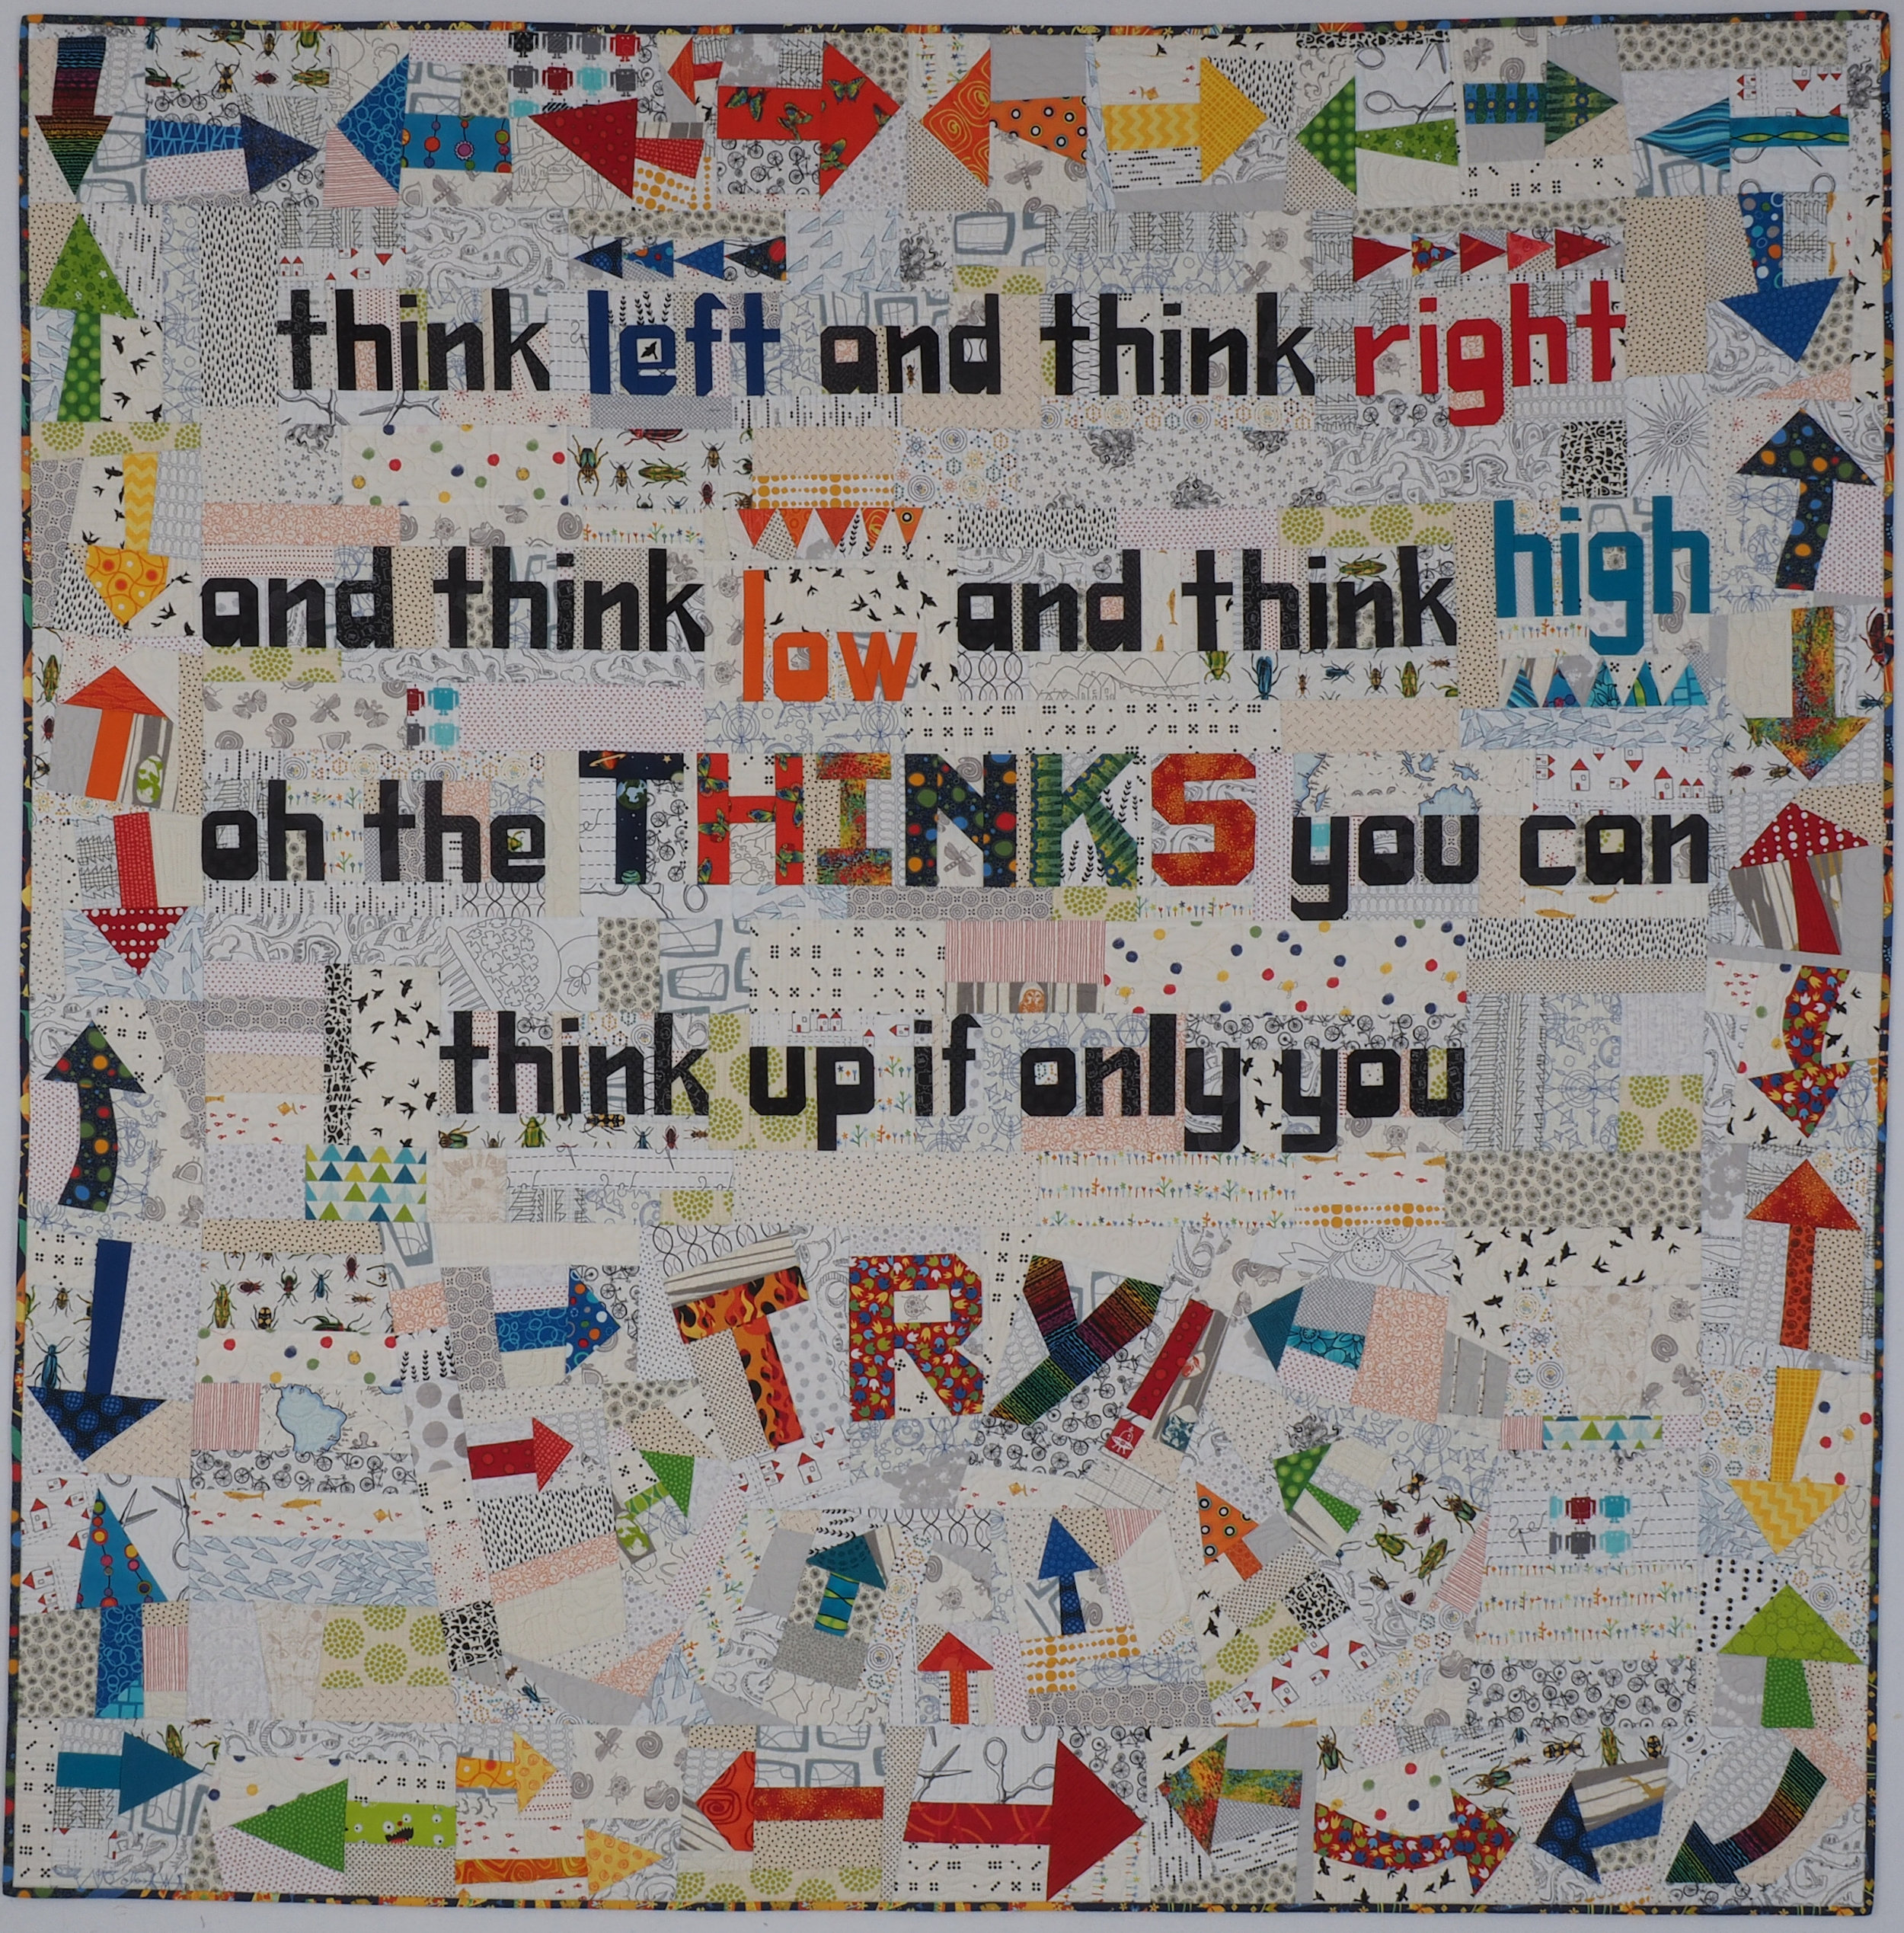 THINK by Toni Davis